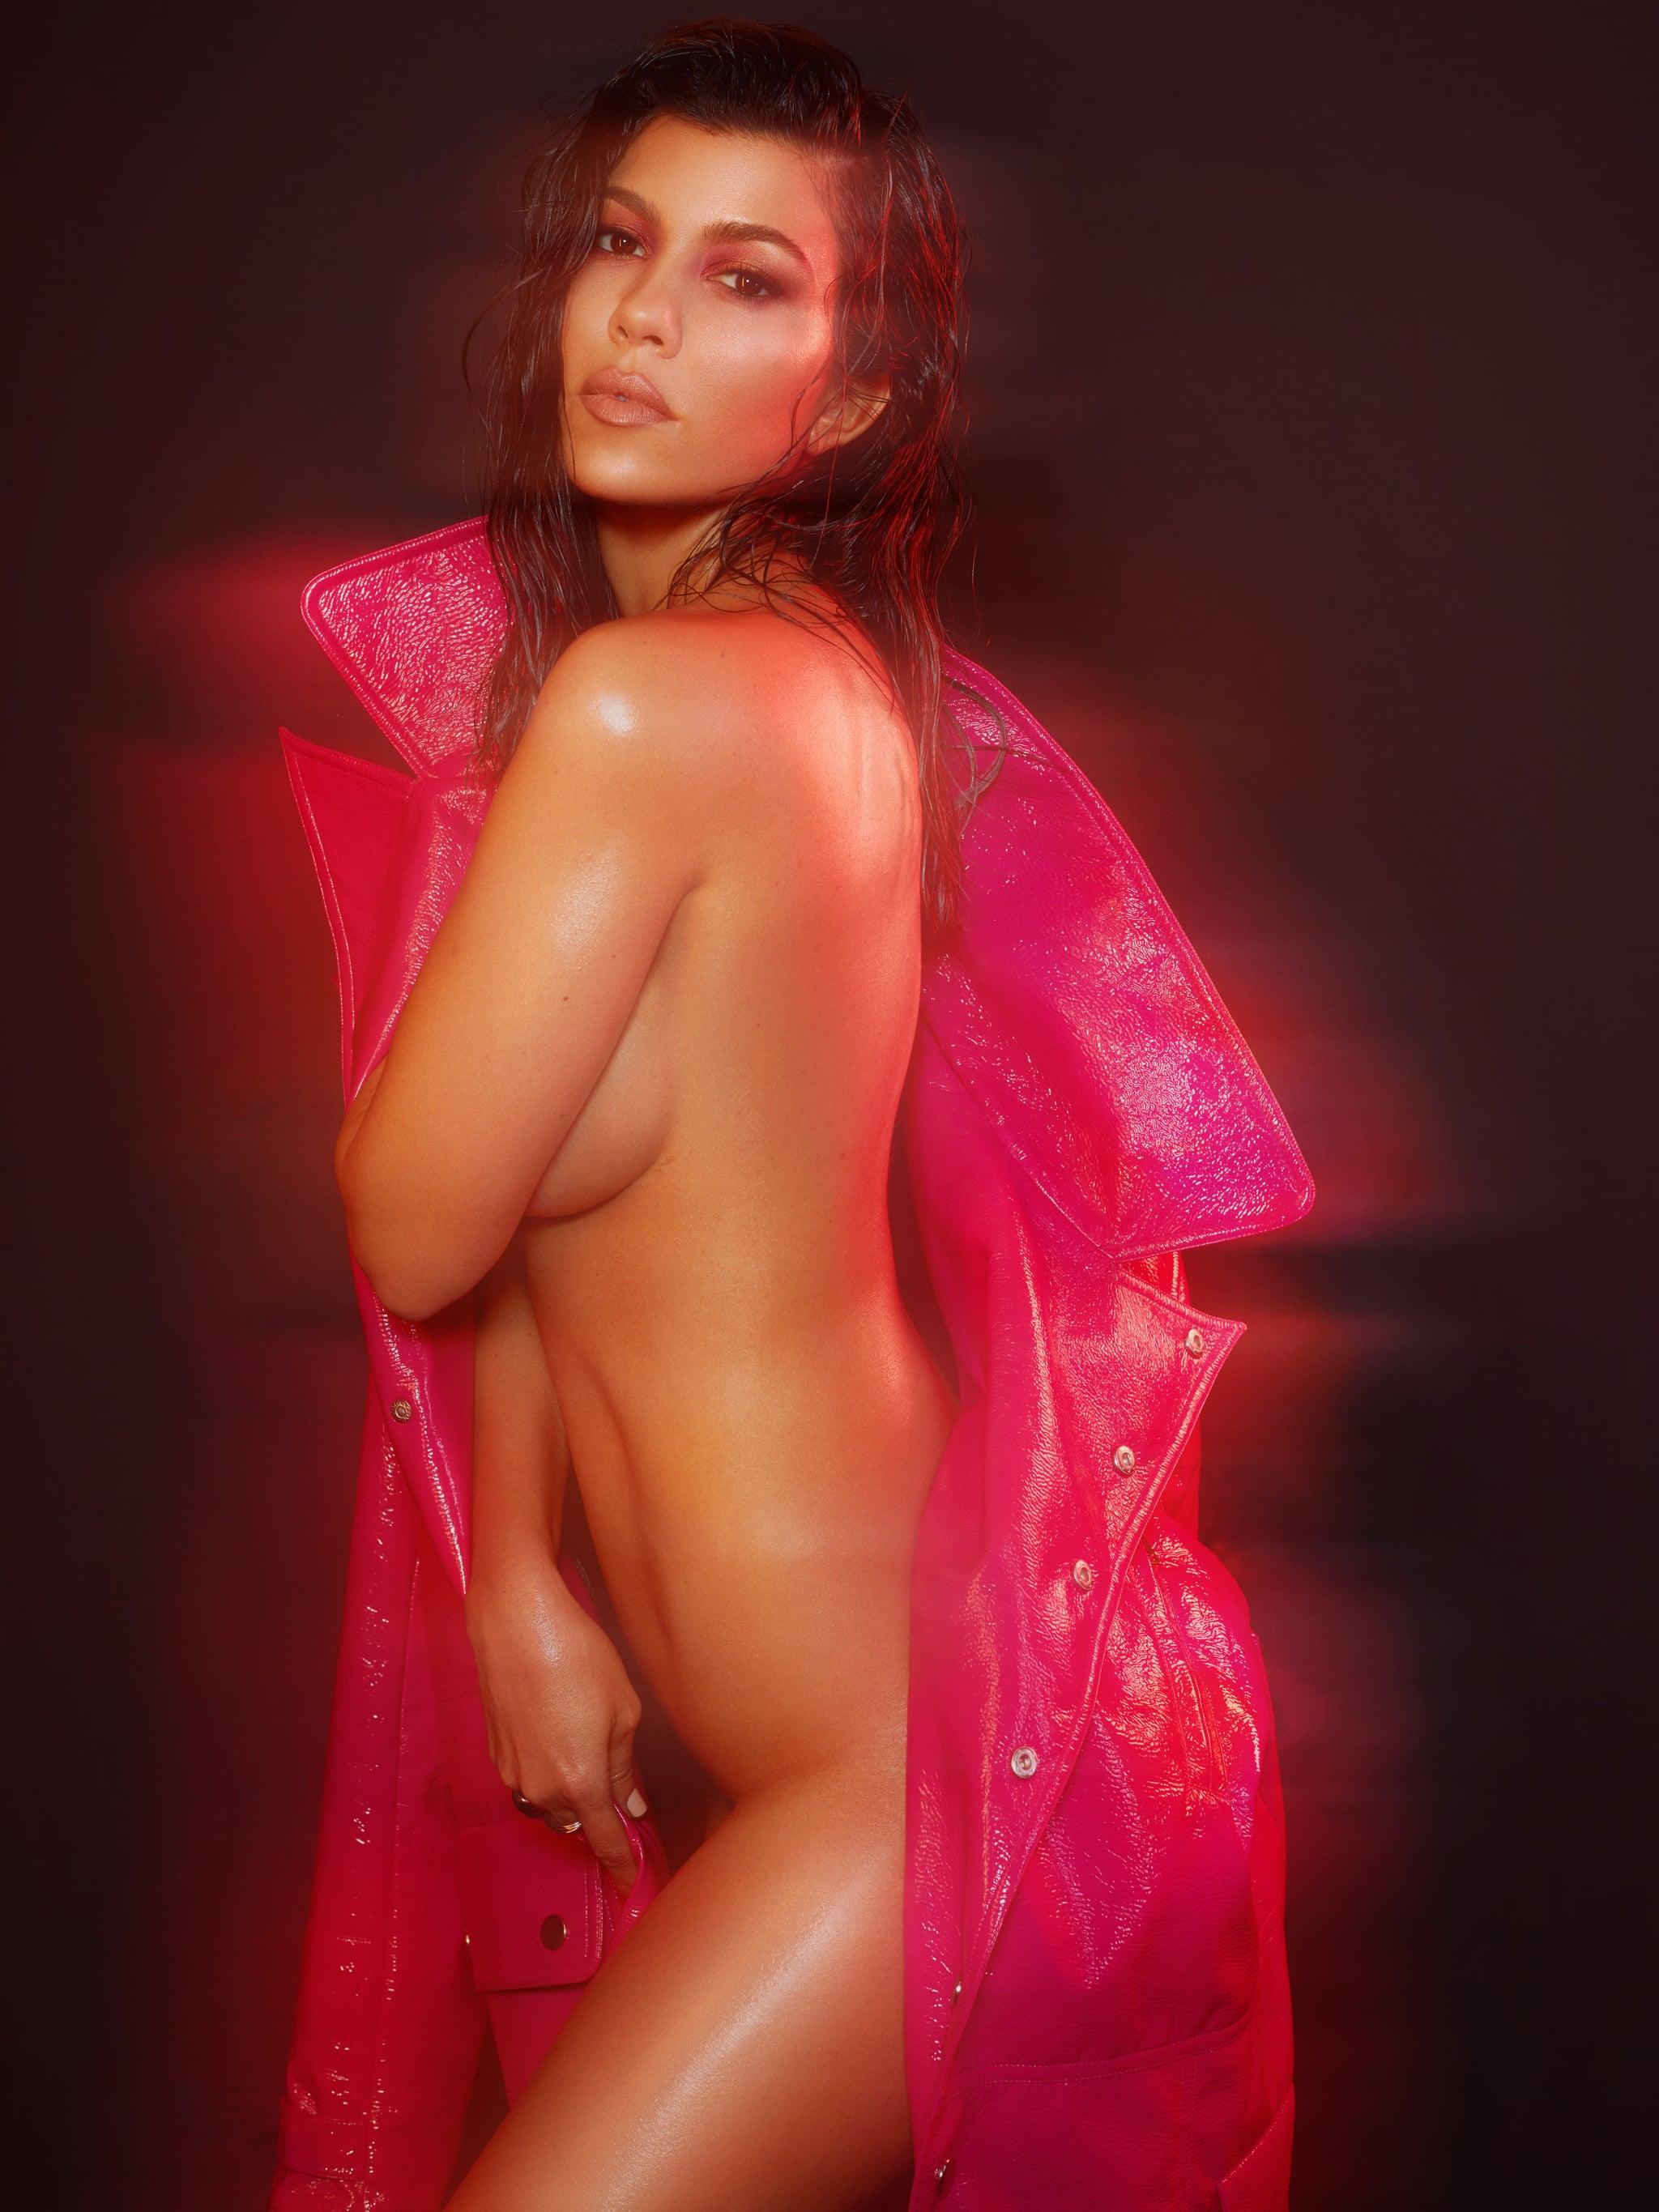 Naked kourtney kardashian Kourtney Kardashian